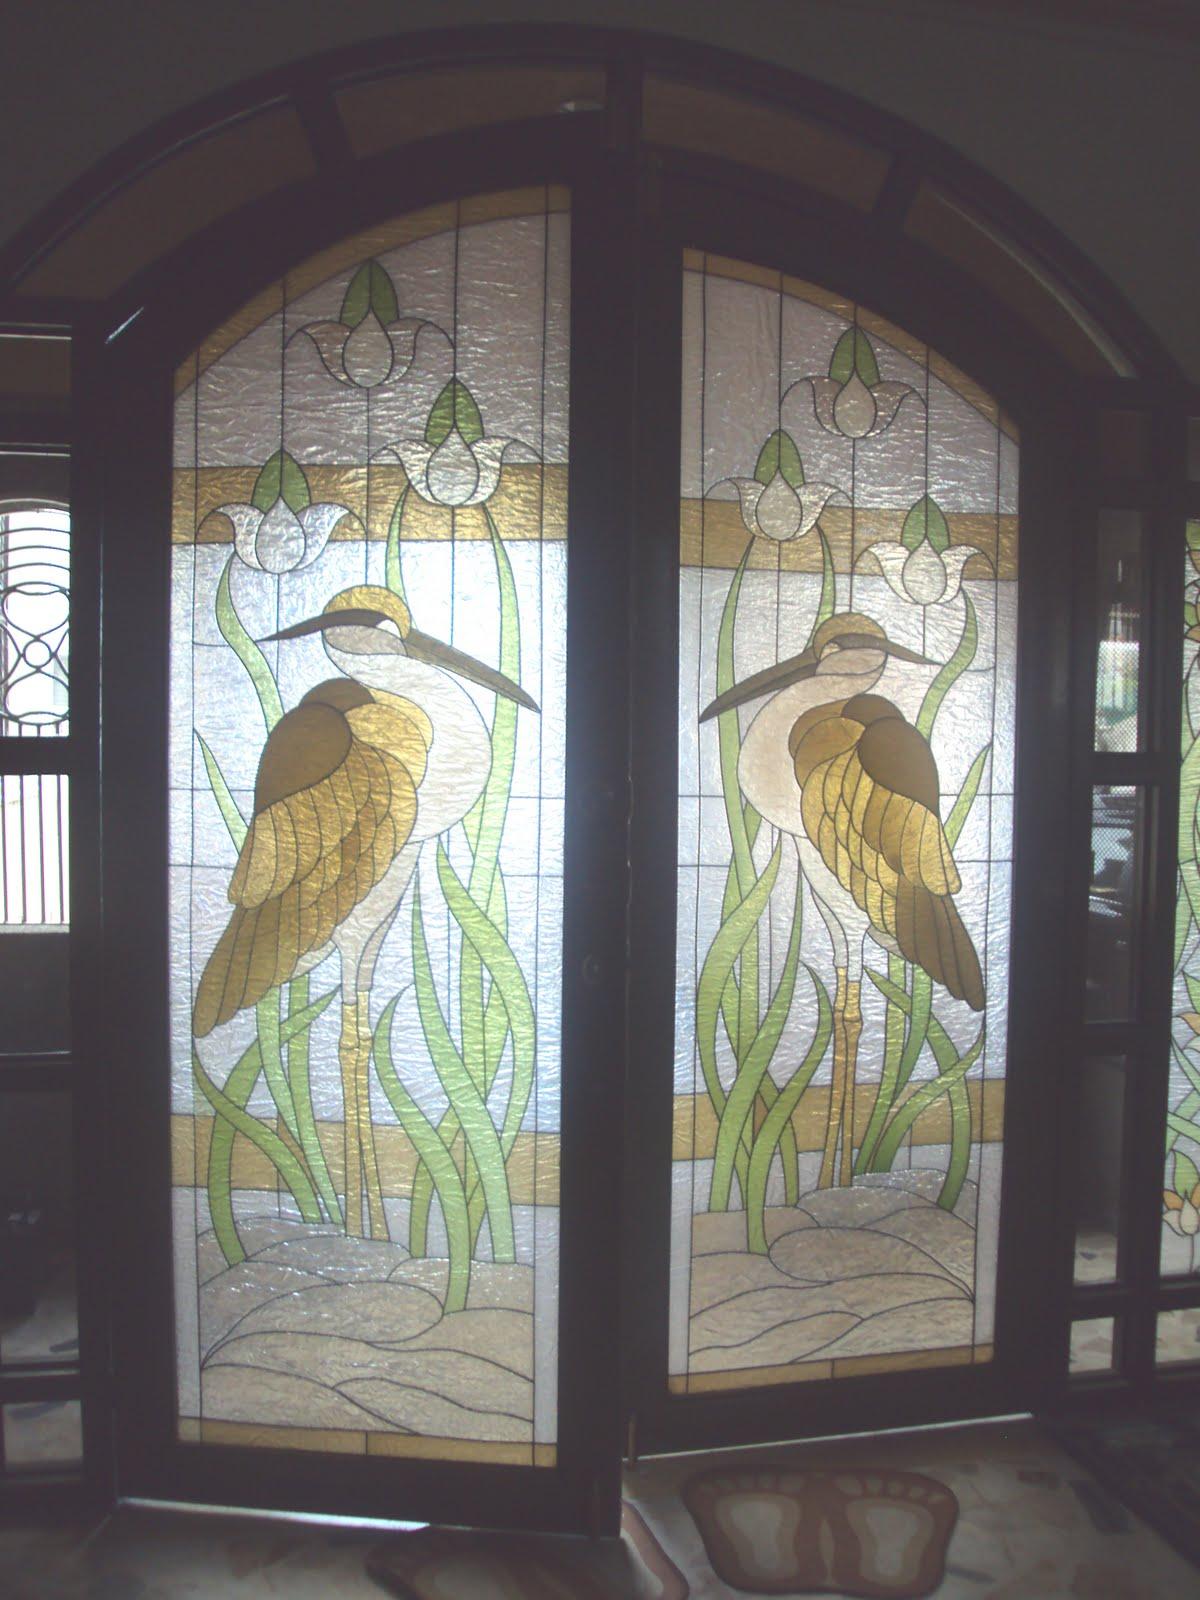 Greatest Dekora Glass Art |Stained Glass ( Fiberglass Art) |Etched Glass  PV55